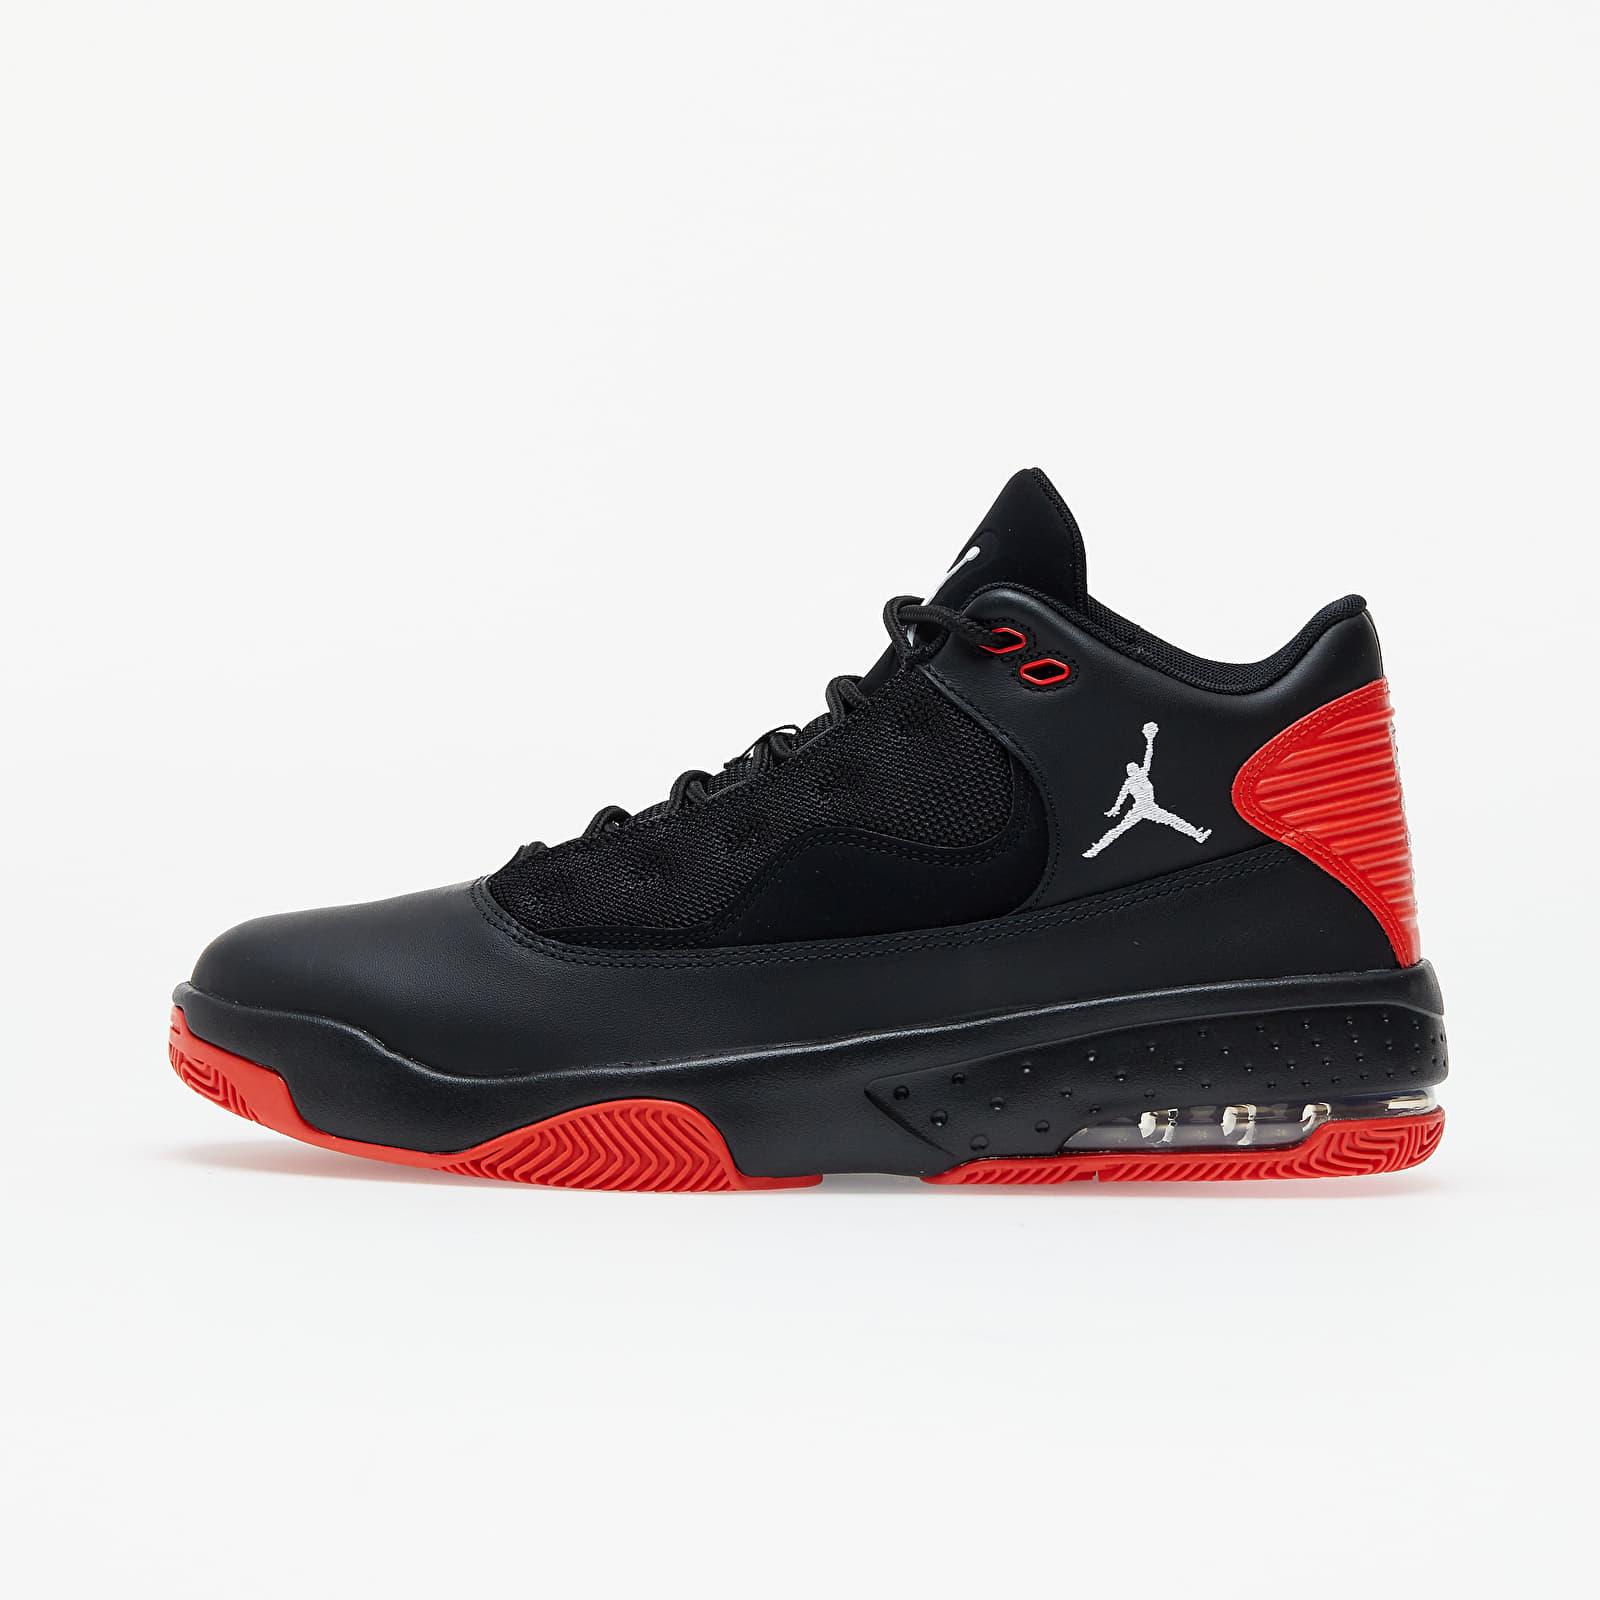 Jordan Max Aura 2 Black/ White-Chile Red   Footshop